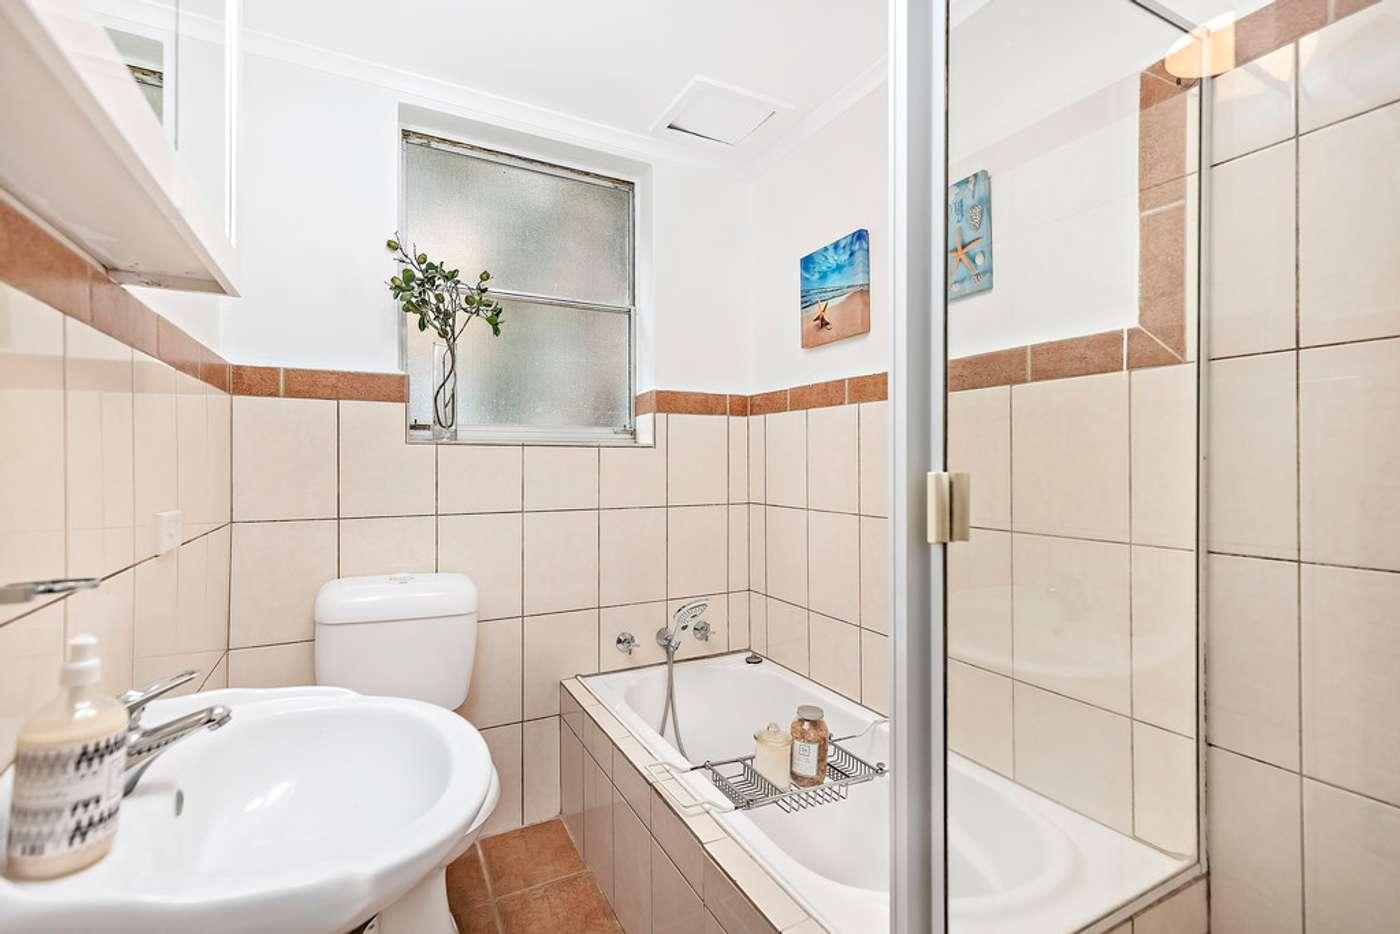 Sixth view of Homely unit listing, 2/22 Chandos Street, Ashfield NSW 2131